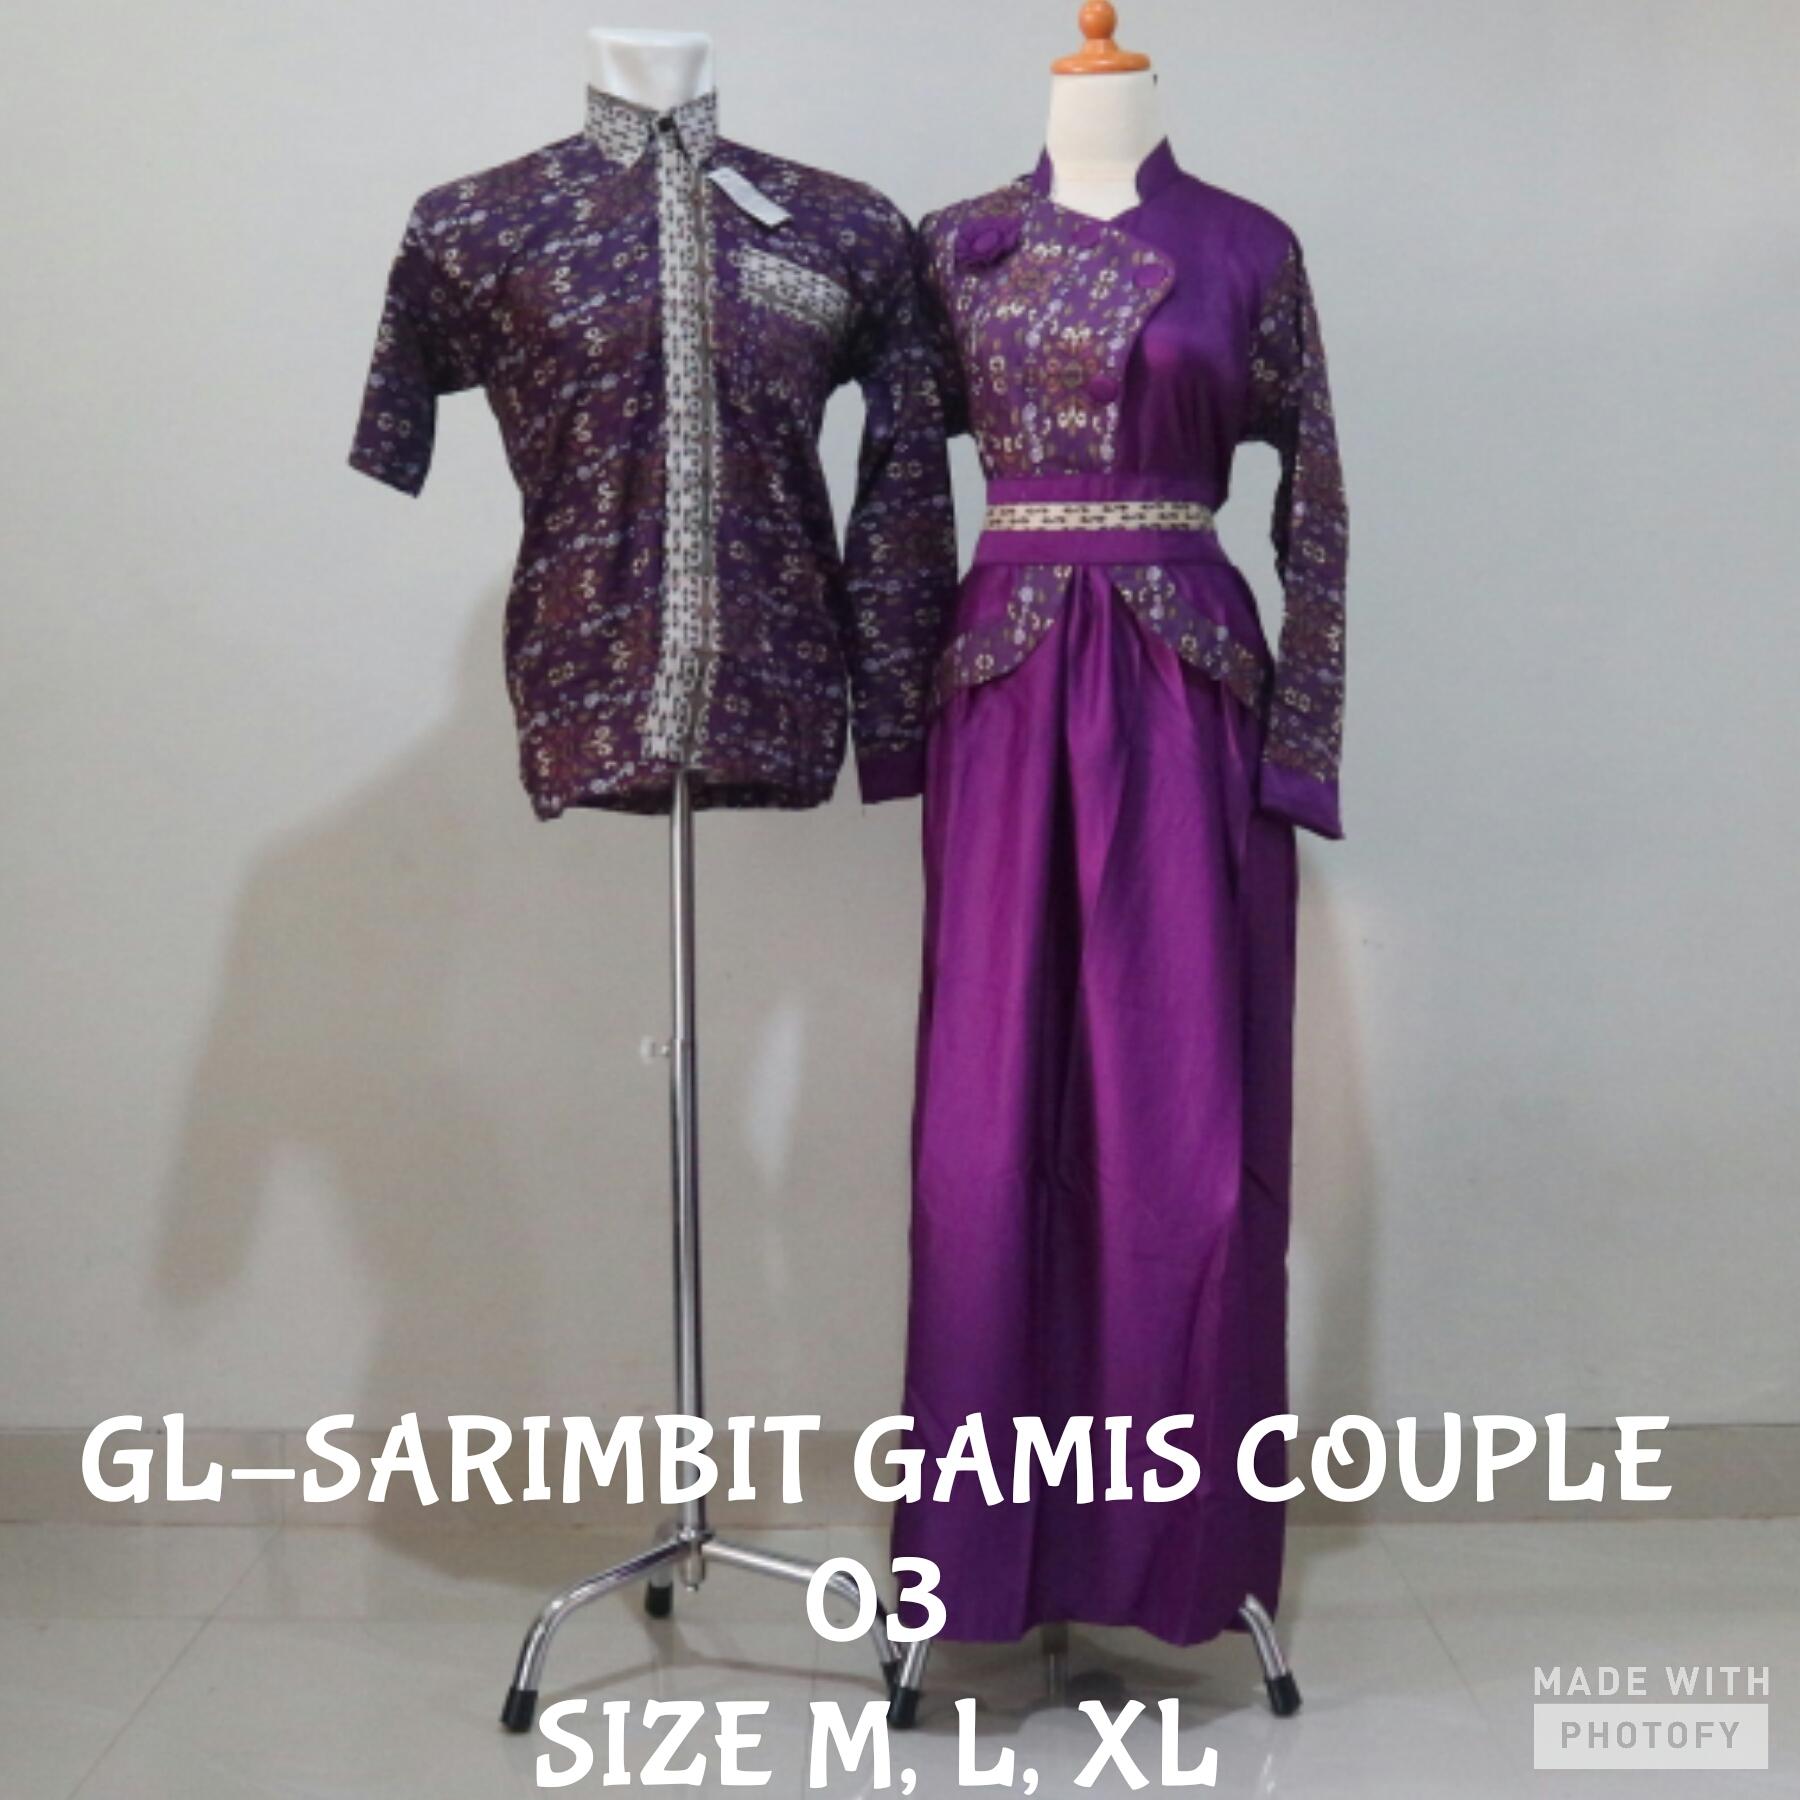 Jual Koko Longdress Batik Sarimbit Gamis 03 Baju Lebaran